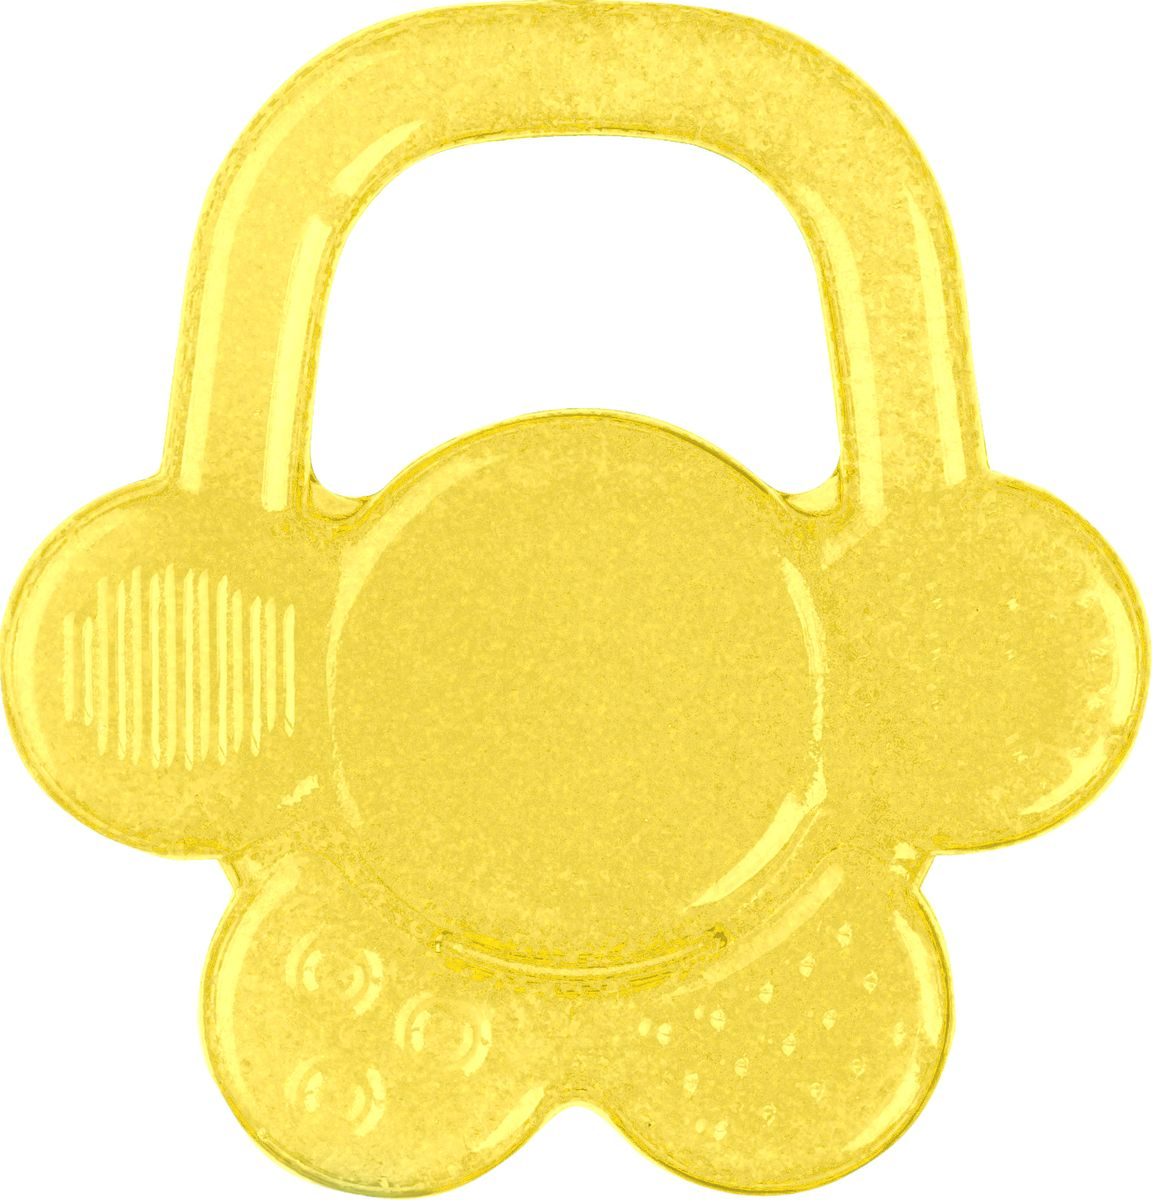 BabyOno Прорезыватель охлаждающий Цветок цвет желтый